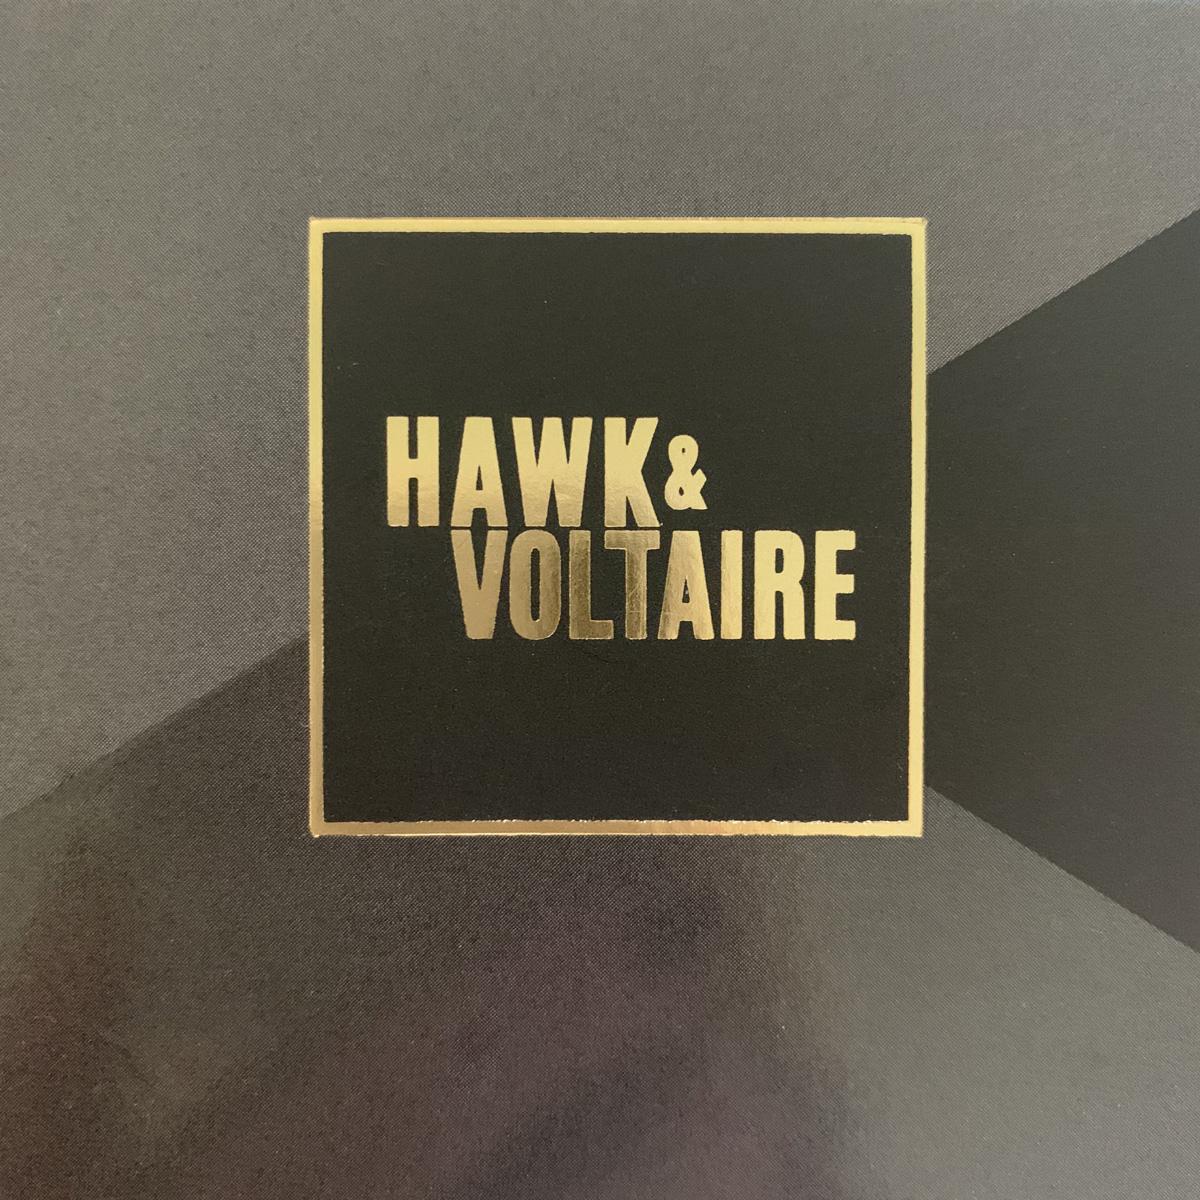 Hawk & Voltaire logo